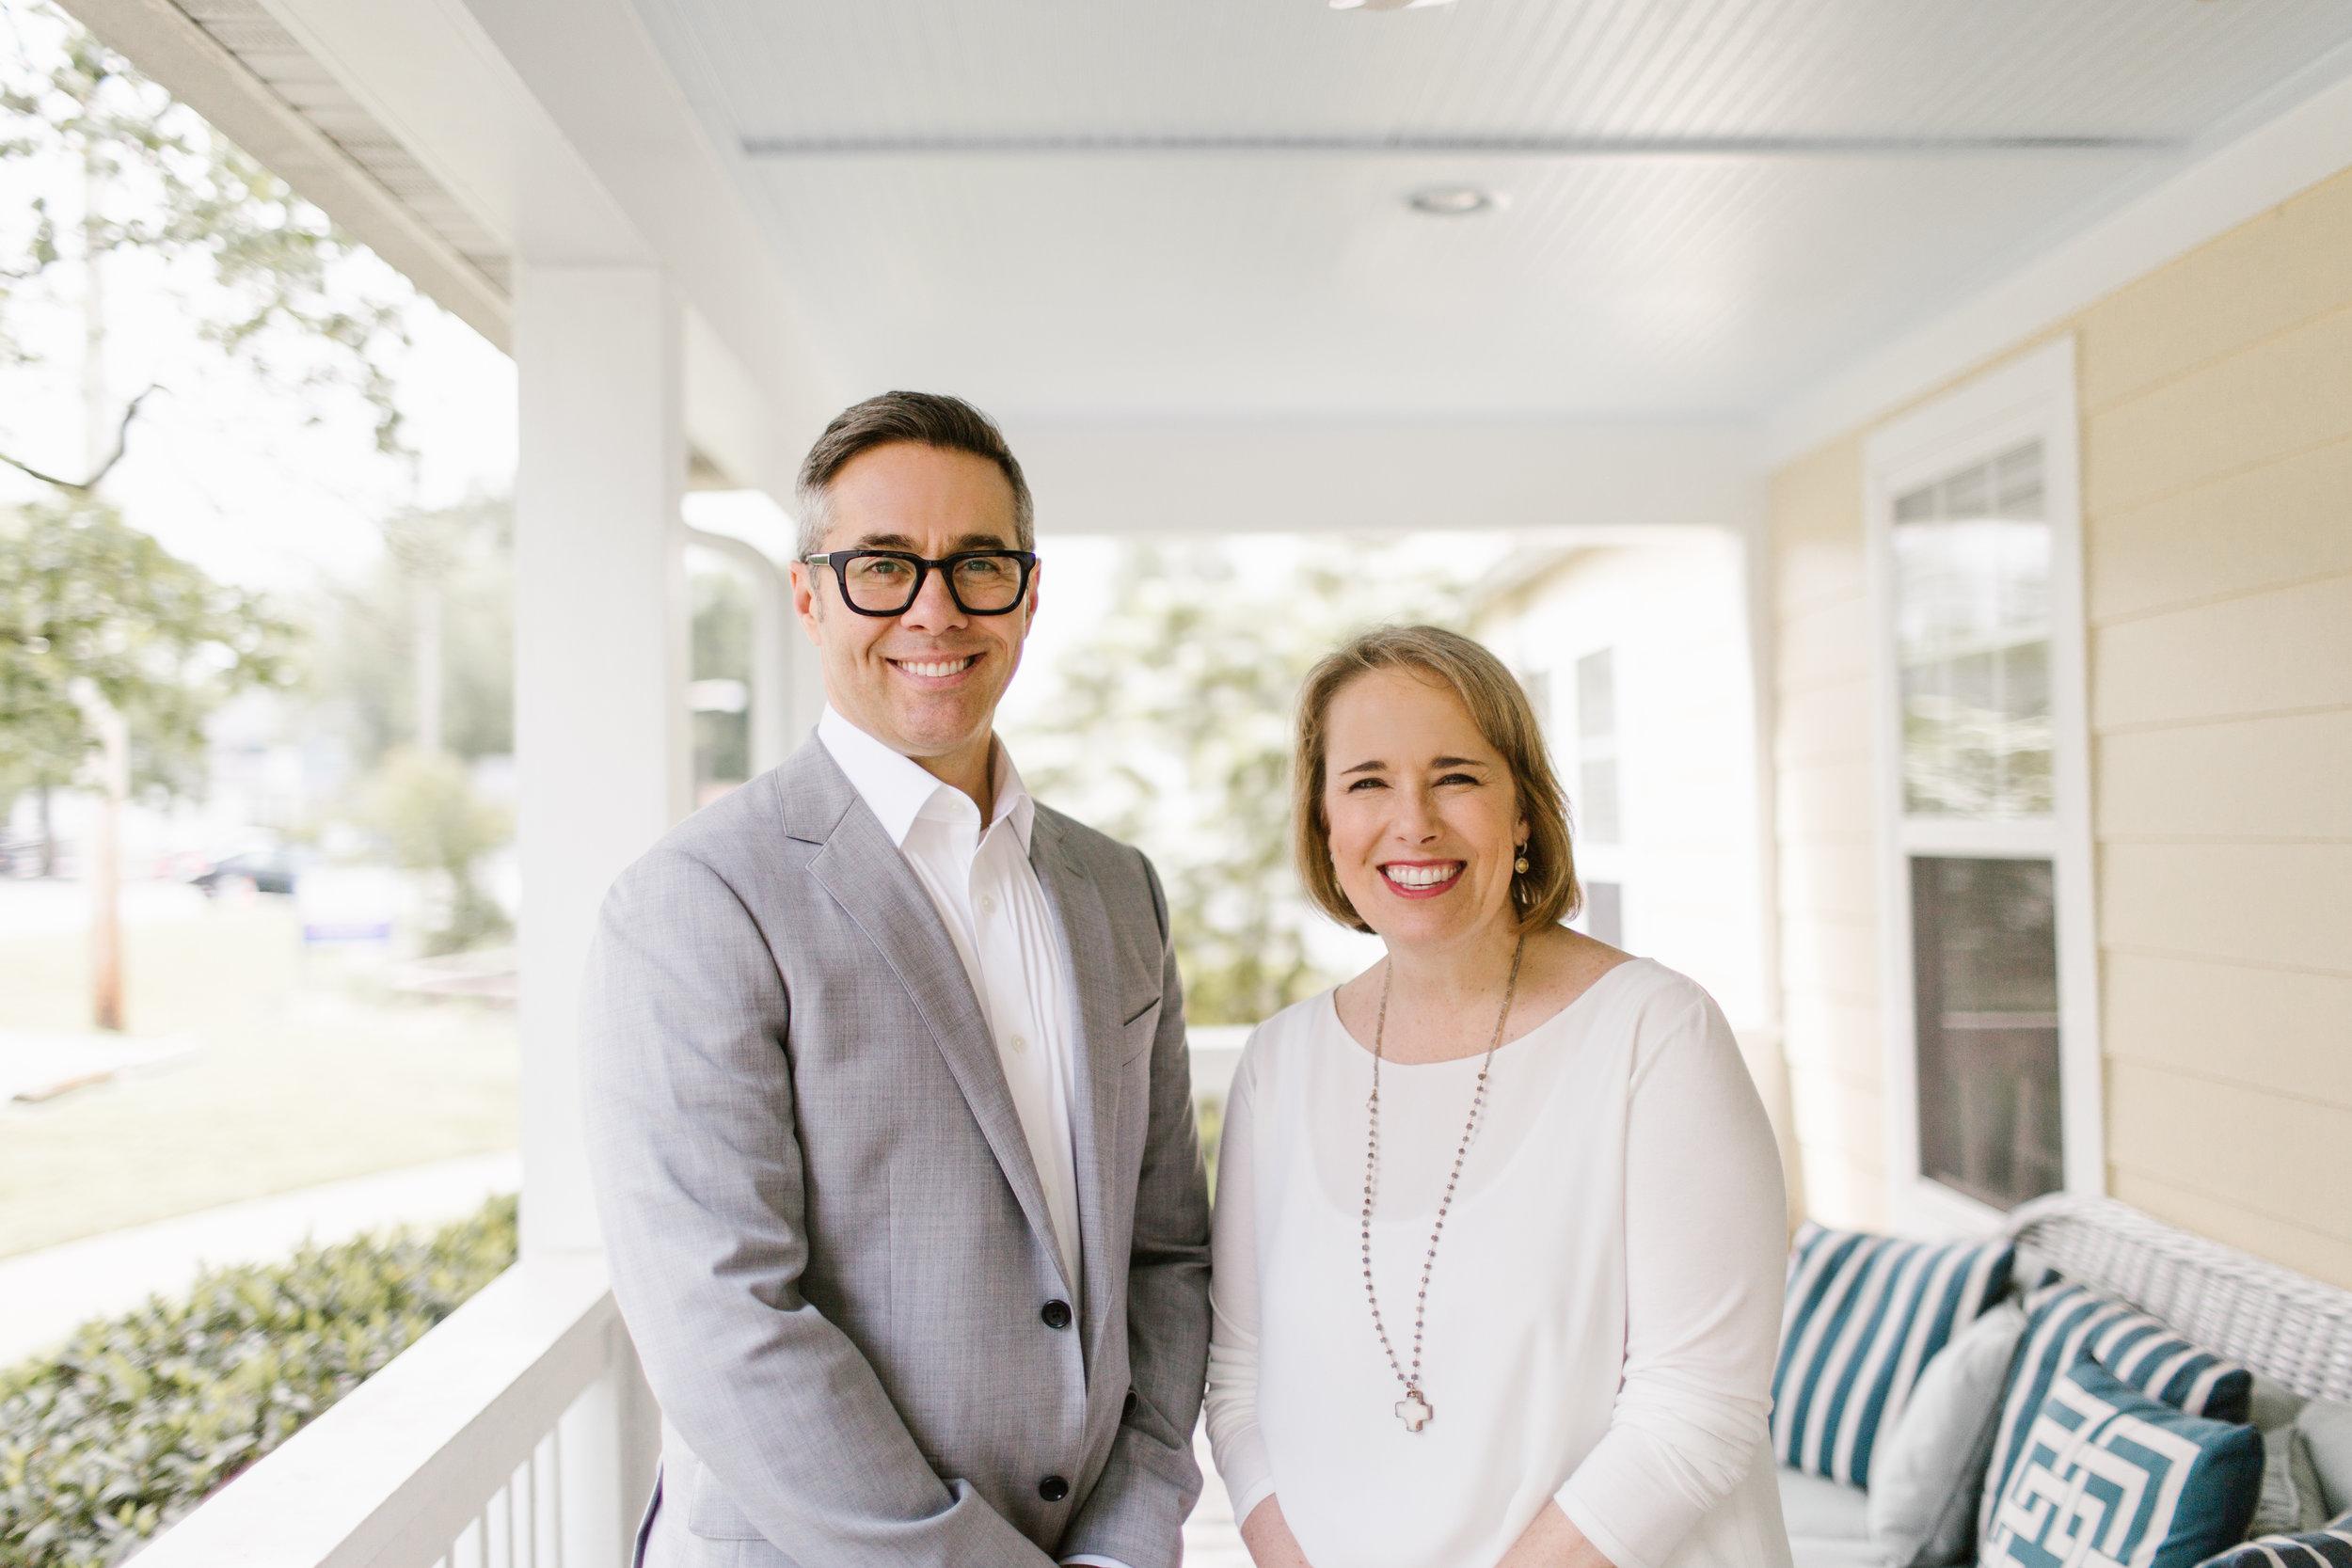 David Thomas and Sissy Goff Horizontal Press Photo